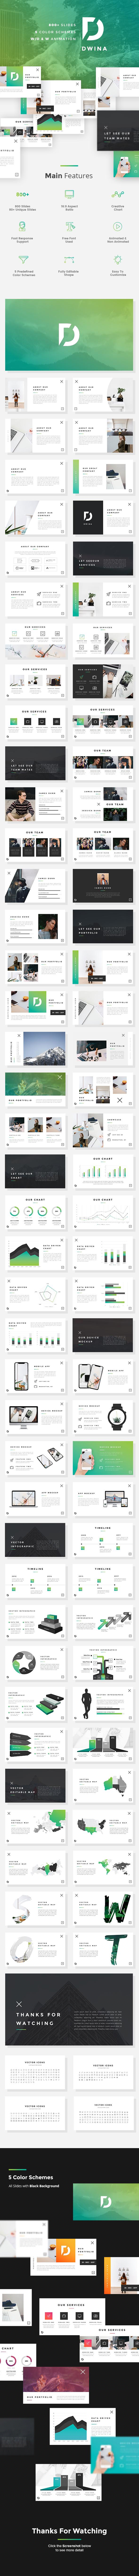 Dwina - Pitch Deck Google Slides Template - Google Slides Presentation Templates